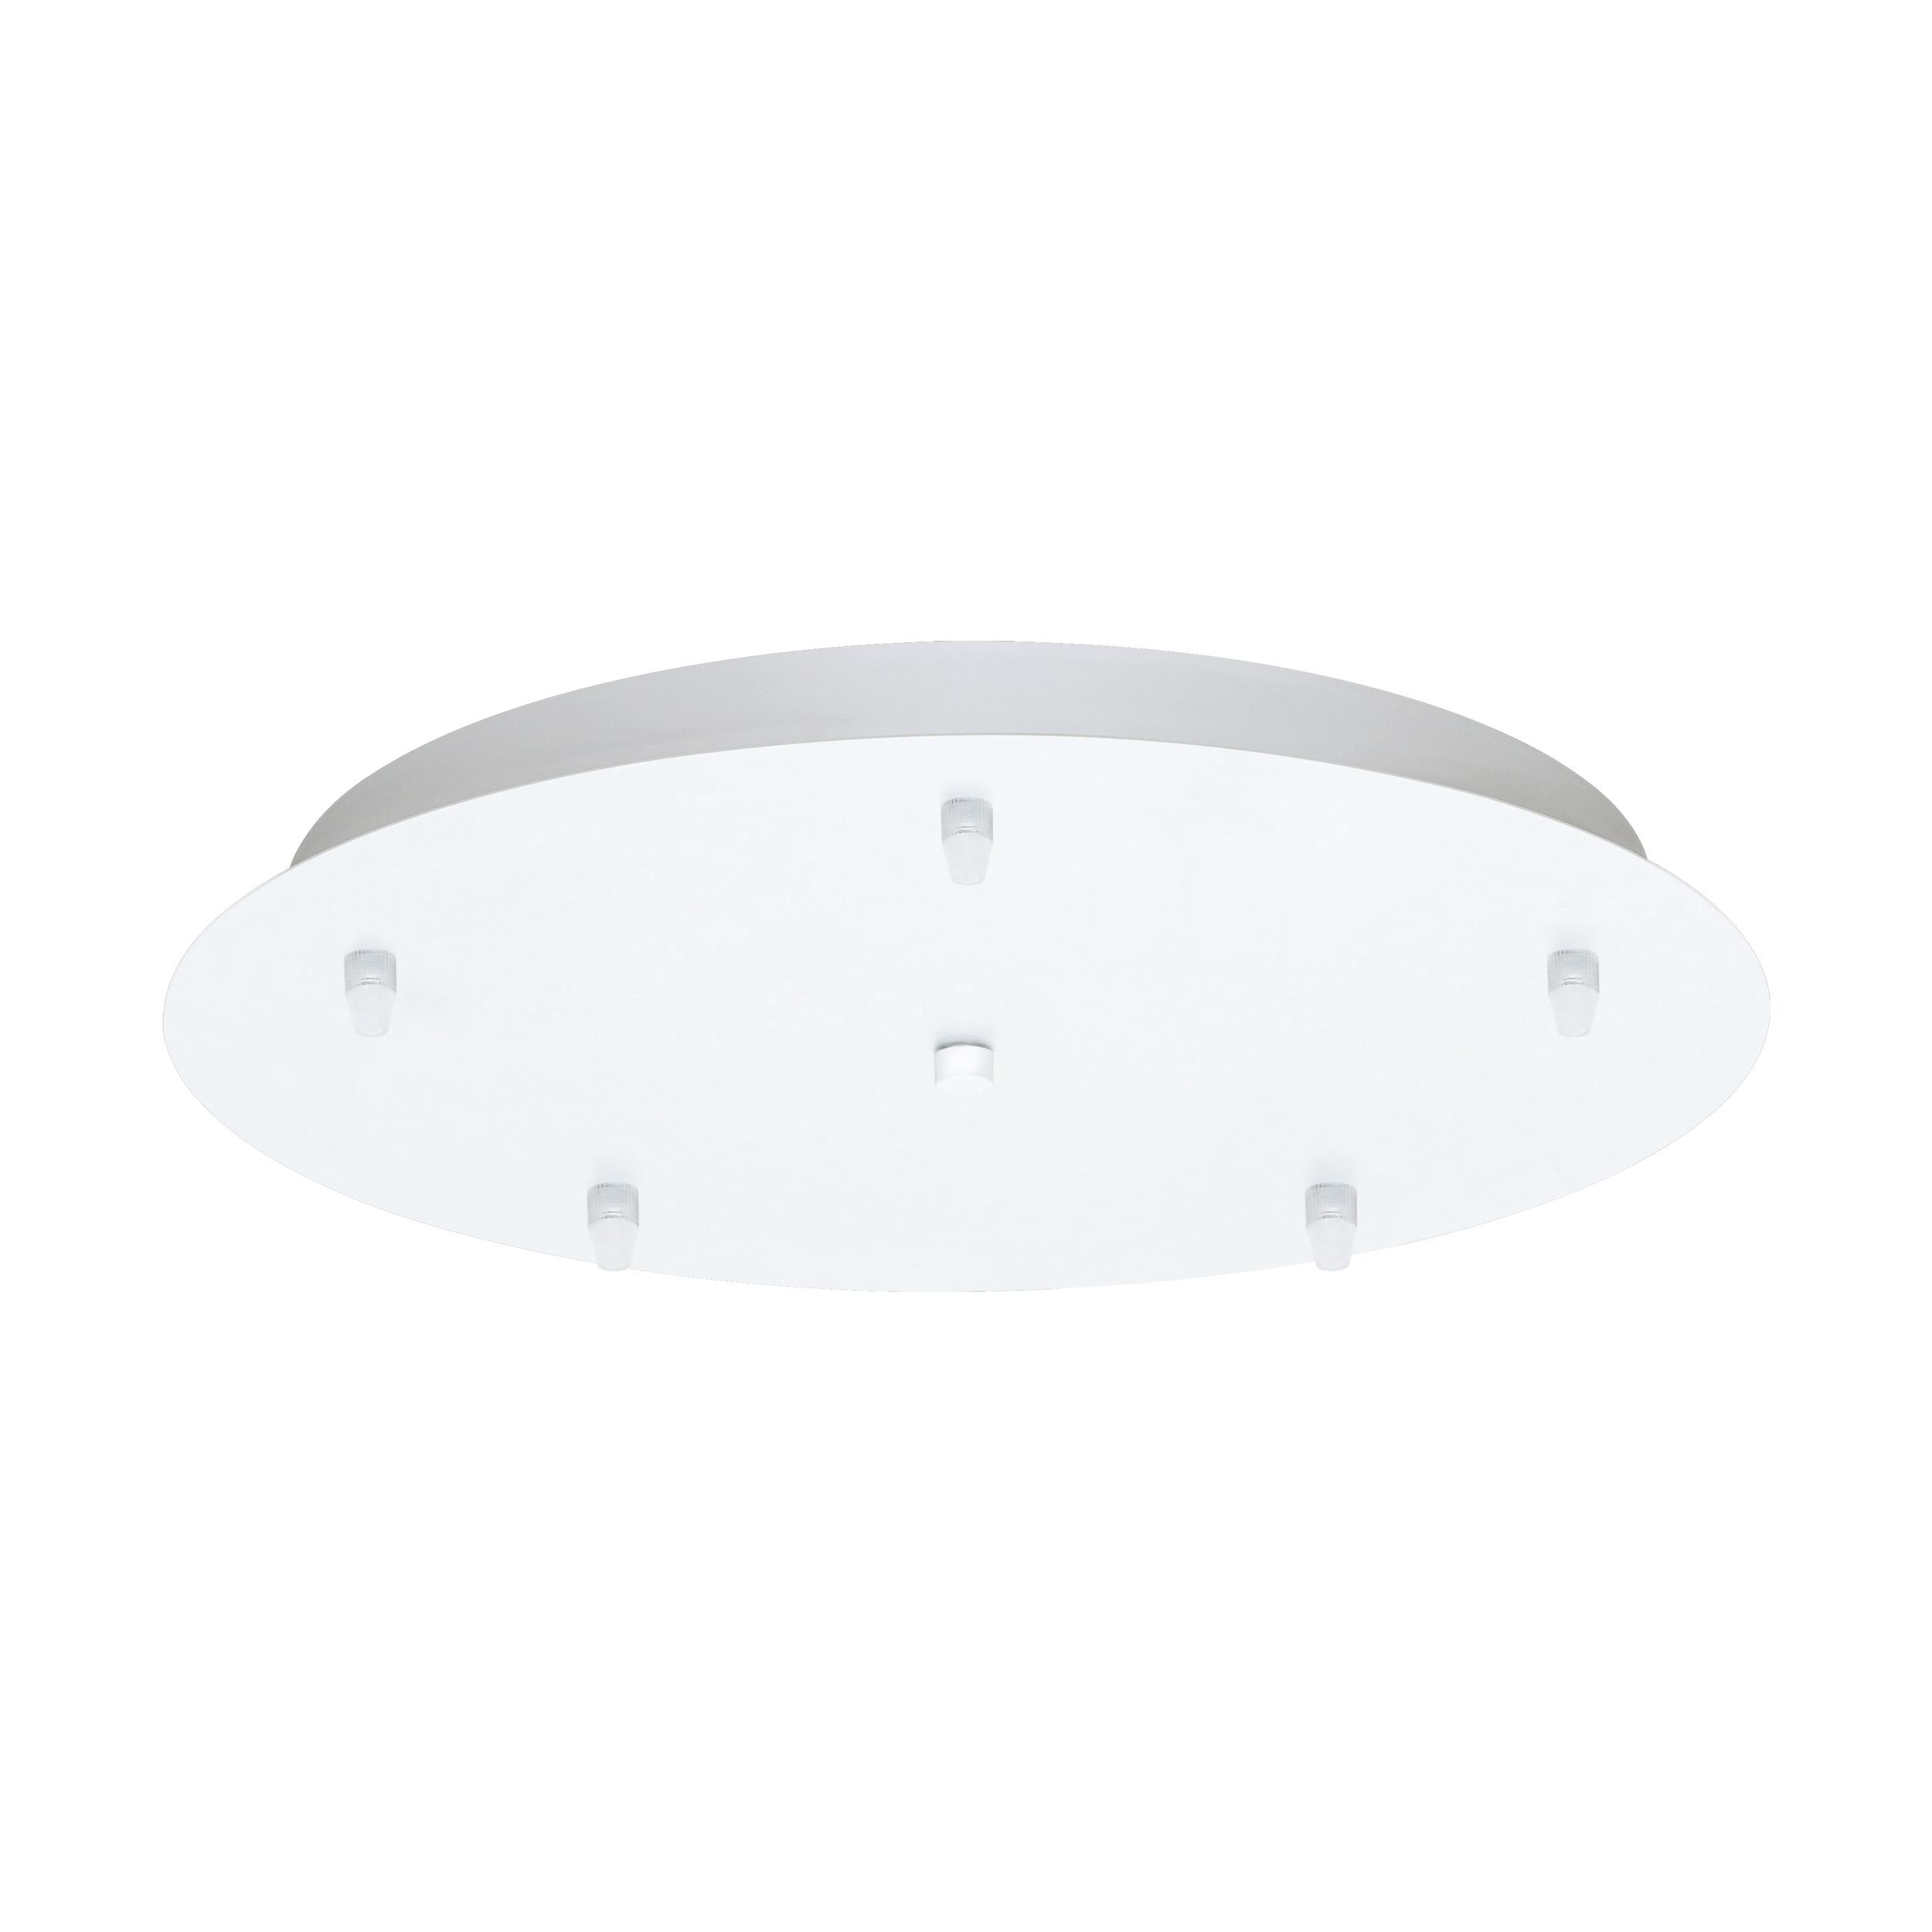 1 Stk Baldachin Pascoa 5 flammig weiß glänzend IP20 LI62316---